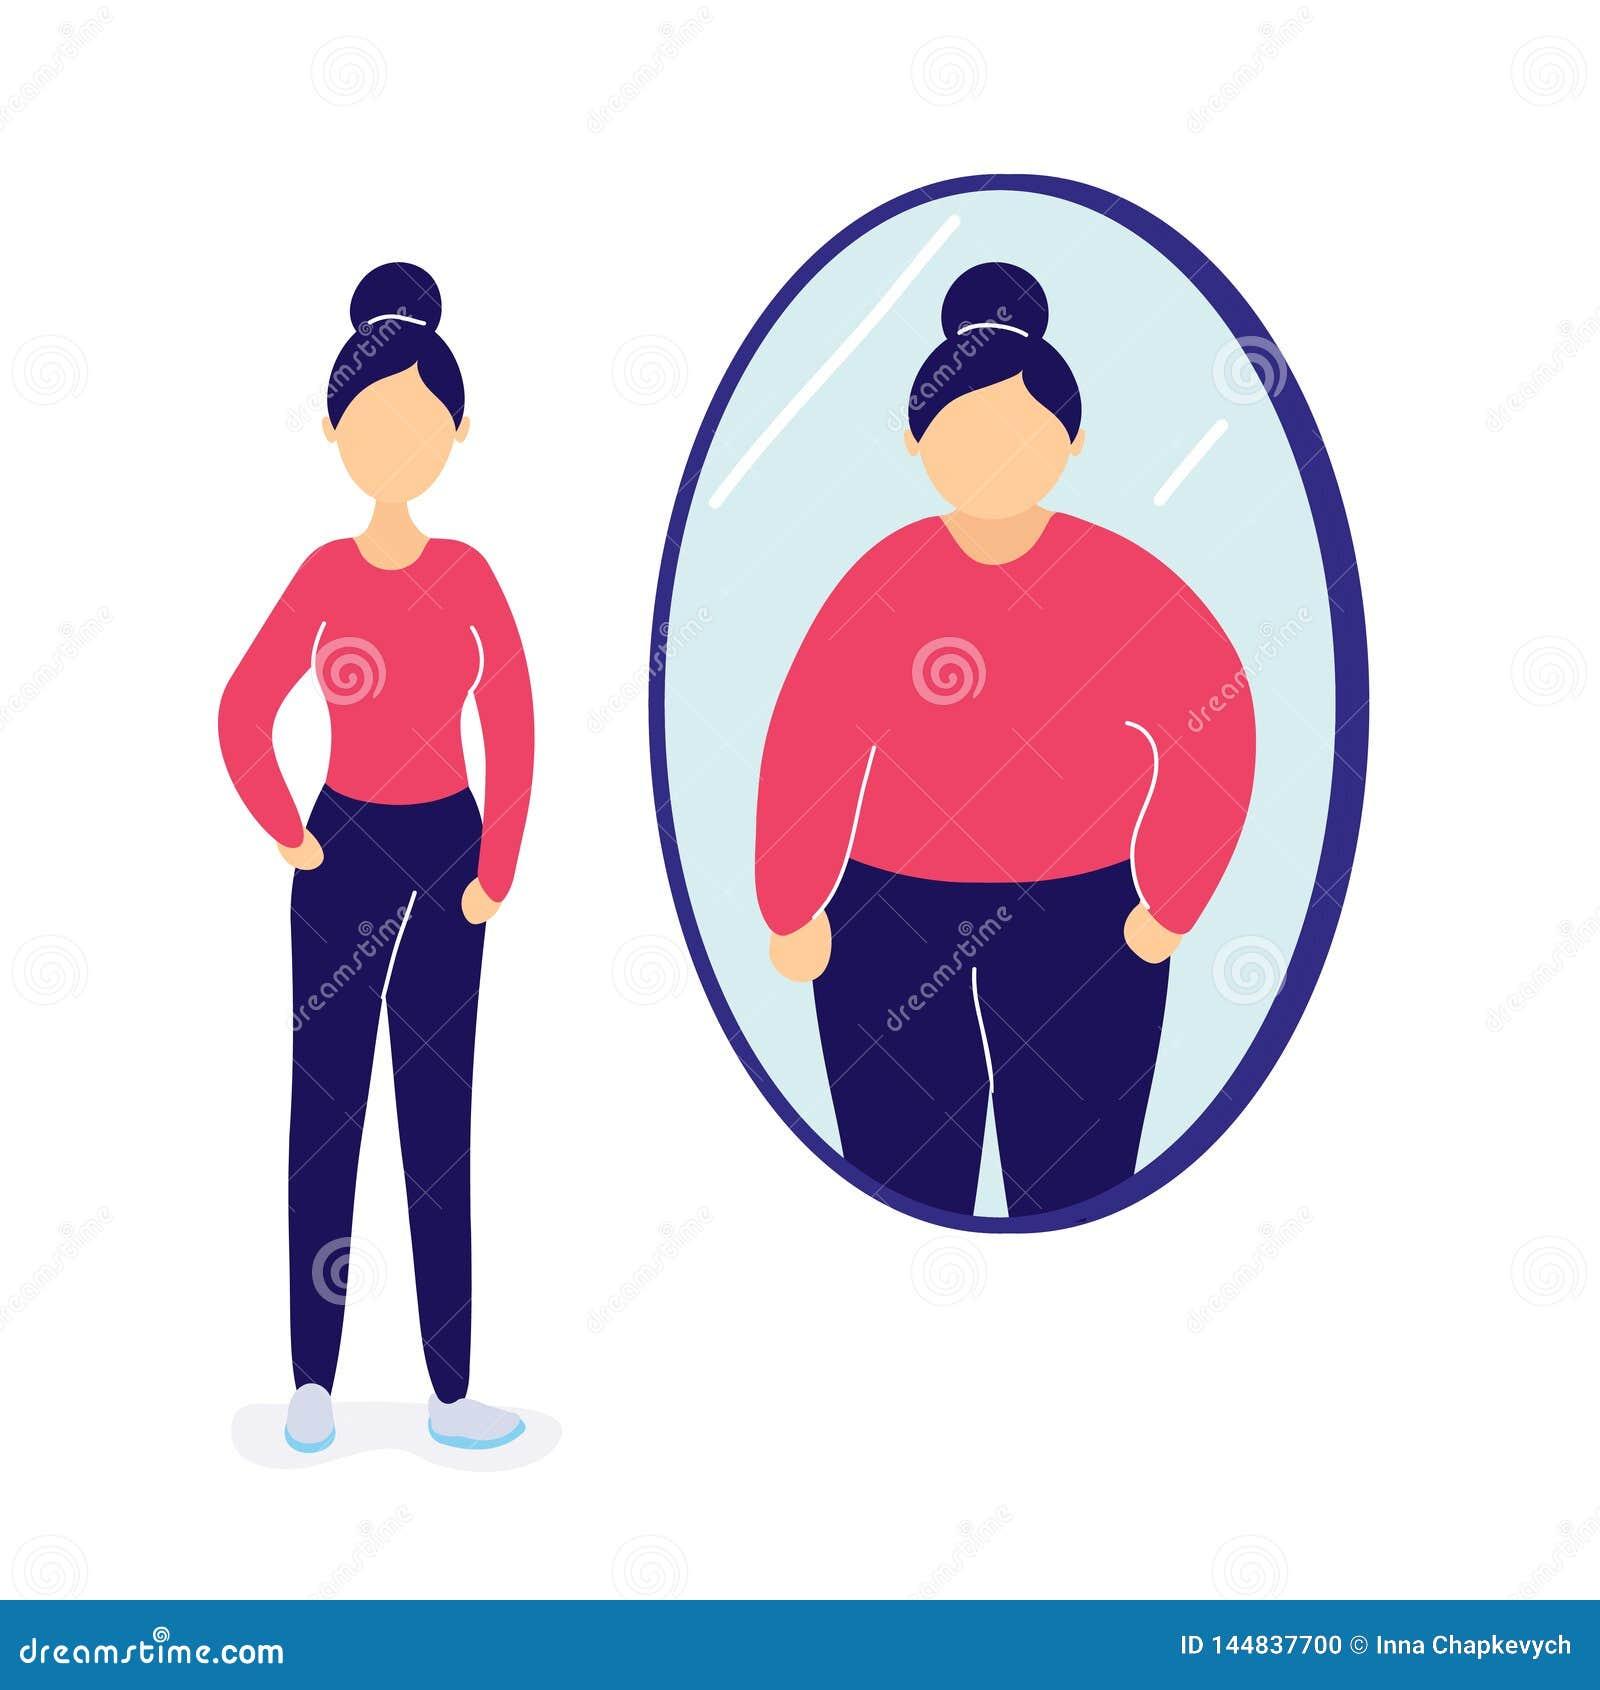 Slim woman seeing herself fat in mirror